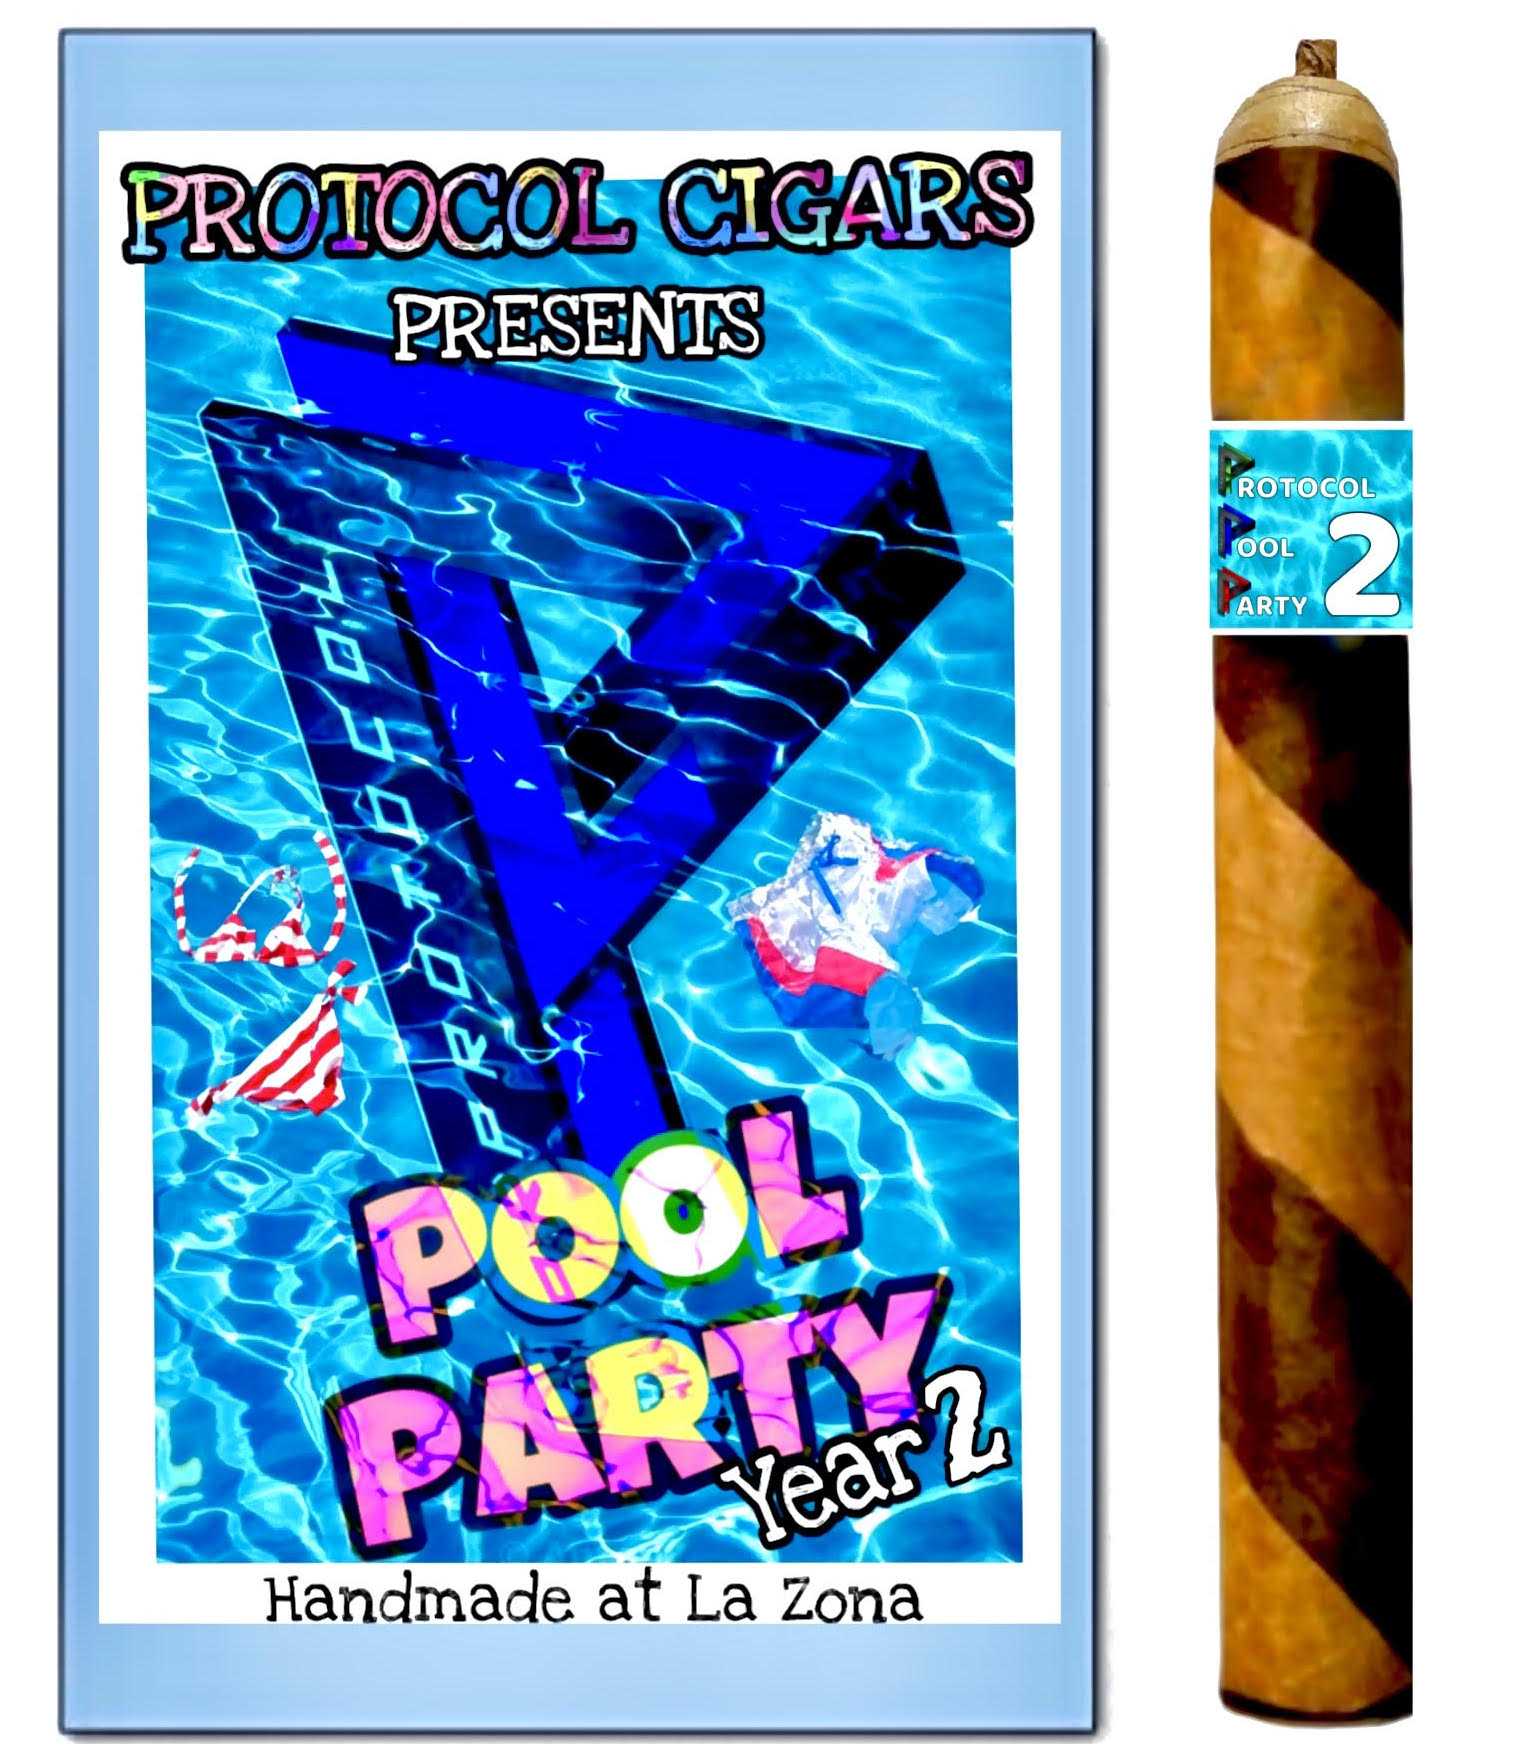 Cigar News: Protocol Pool Party Year 2 Cigar Announced